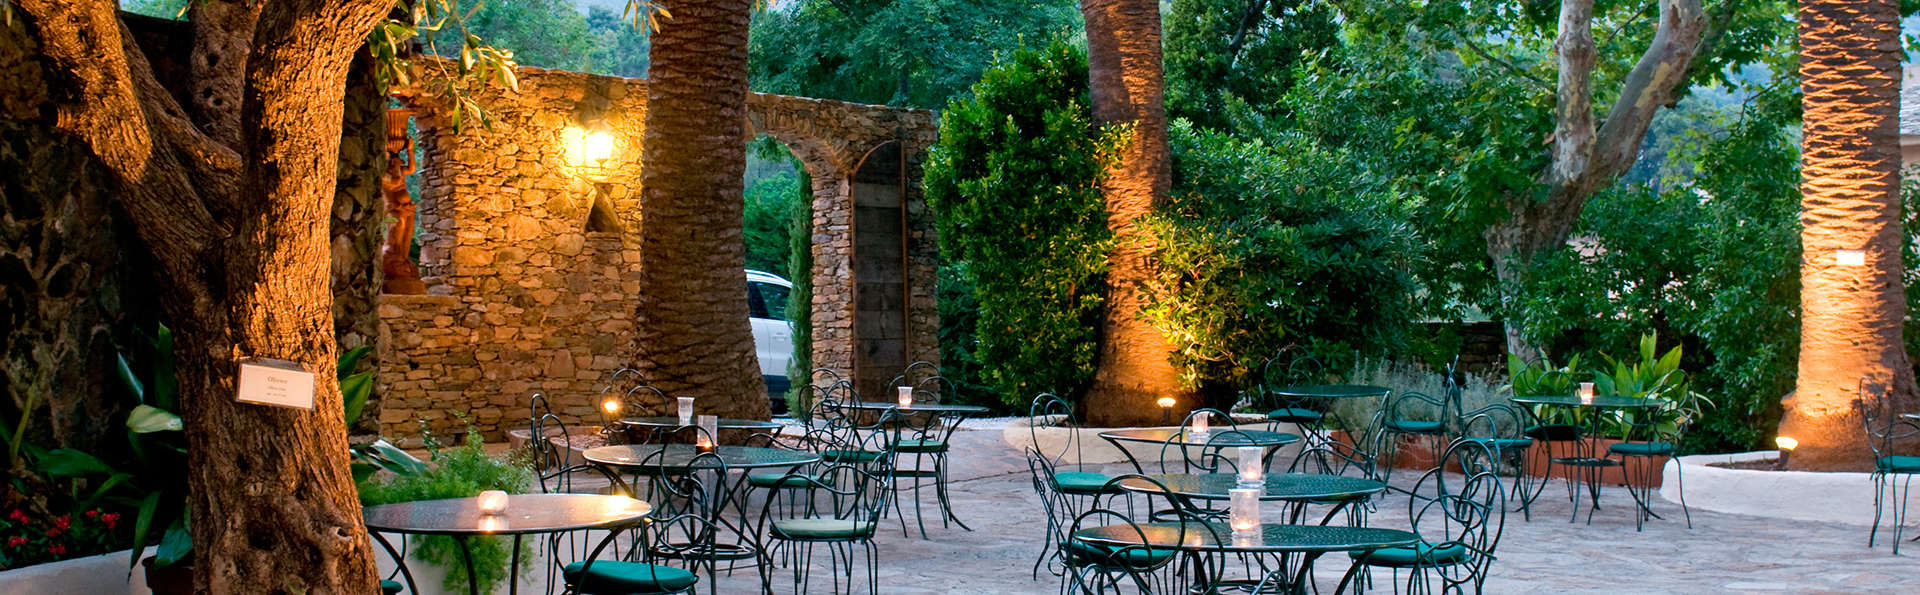 Hôtel Demeure Castel Brando - EDIT_terrace1.jpg